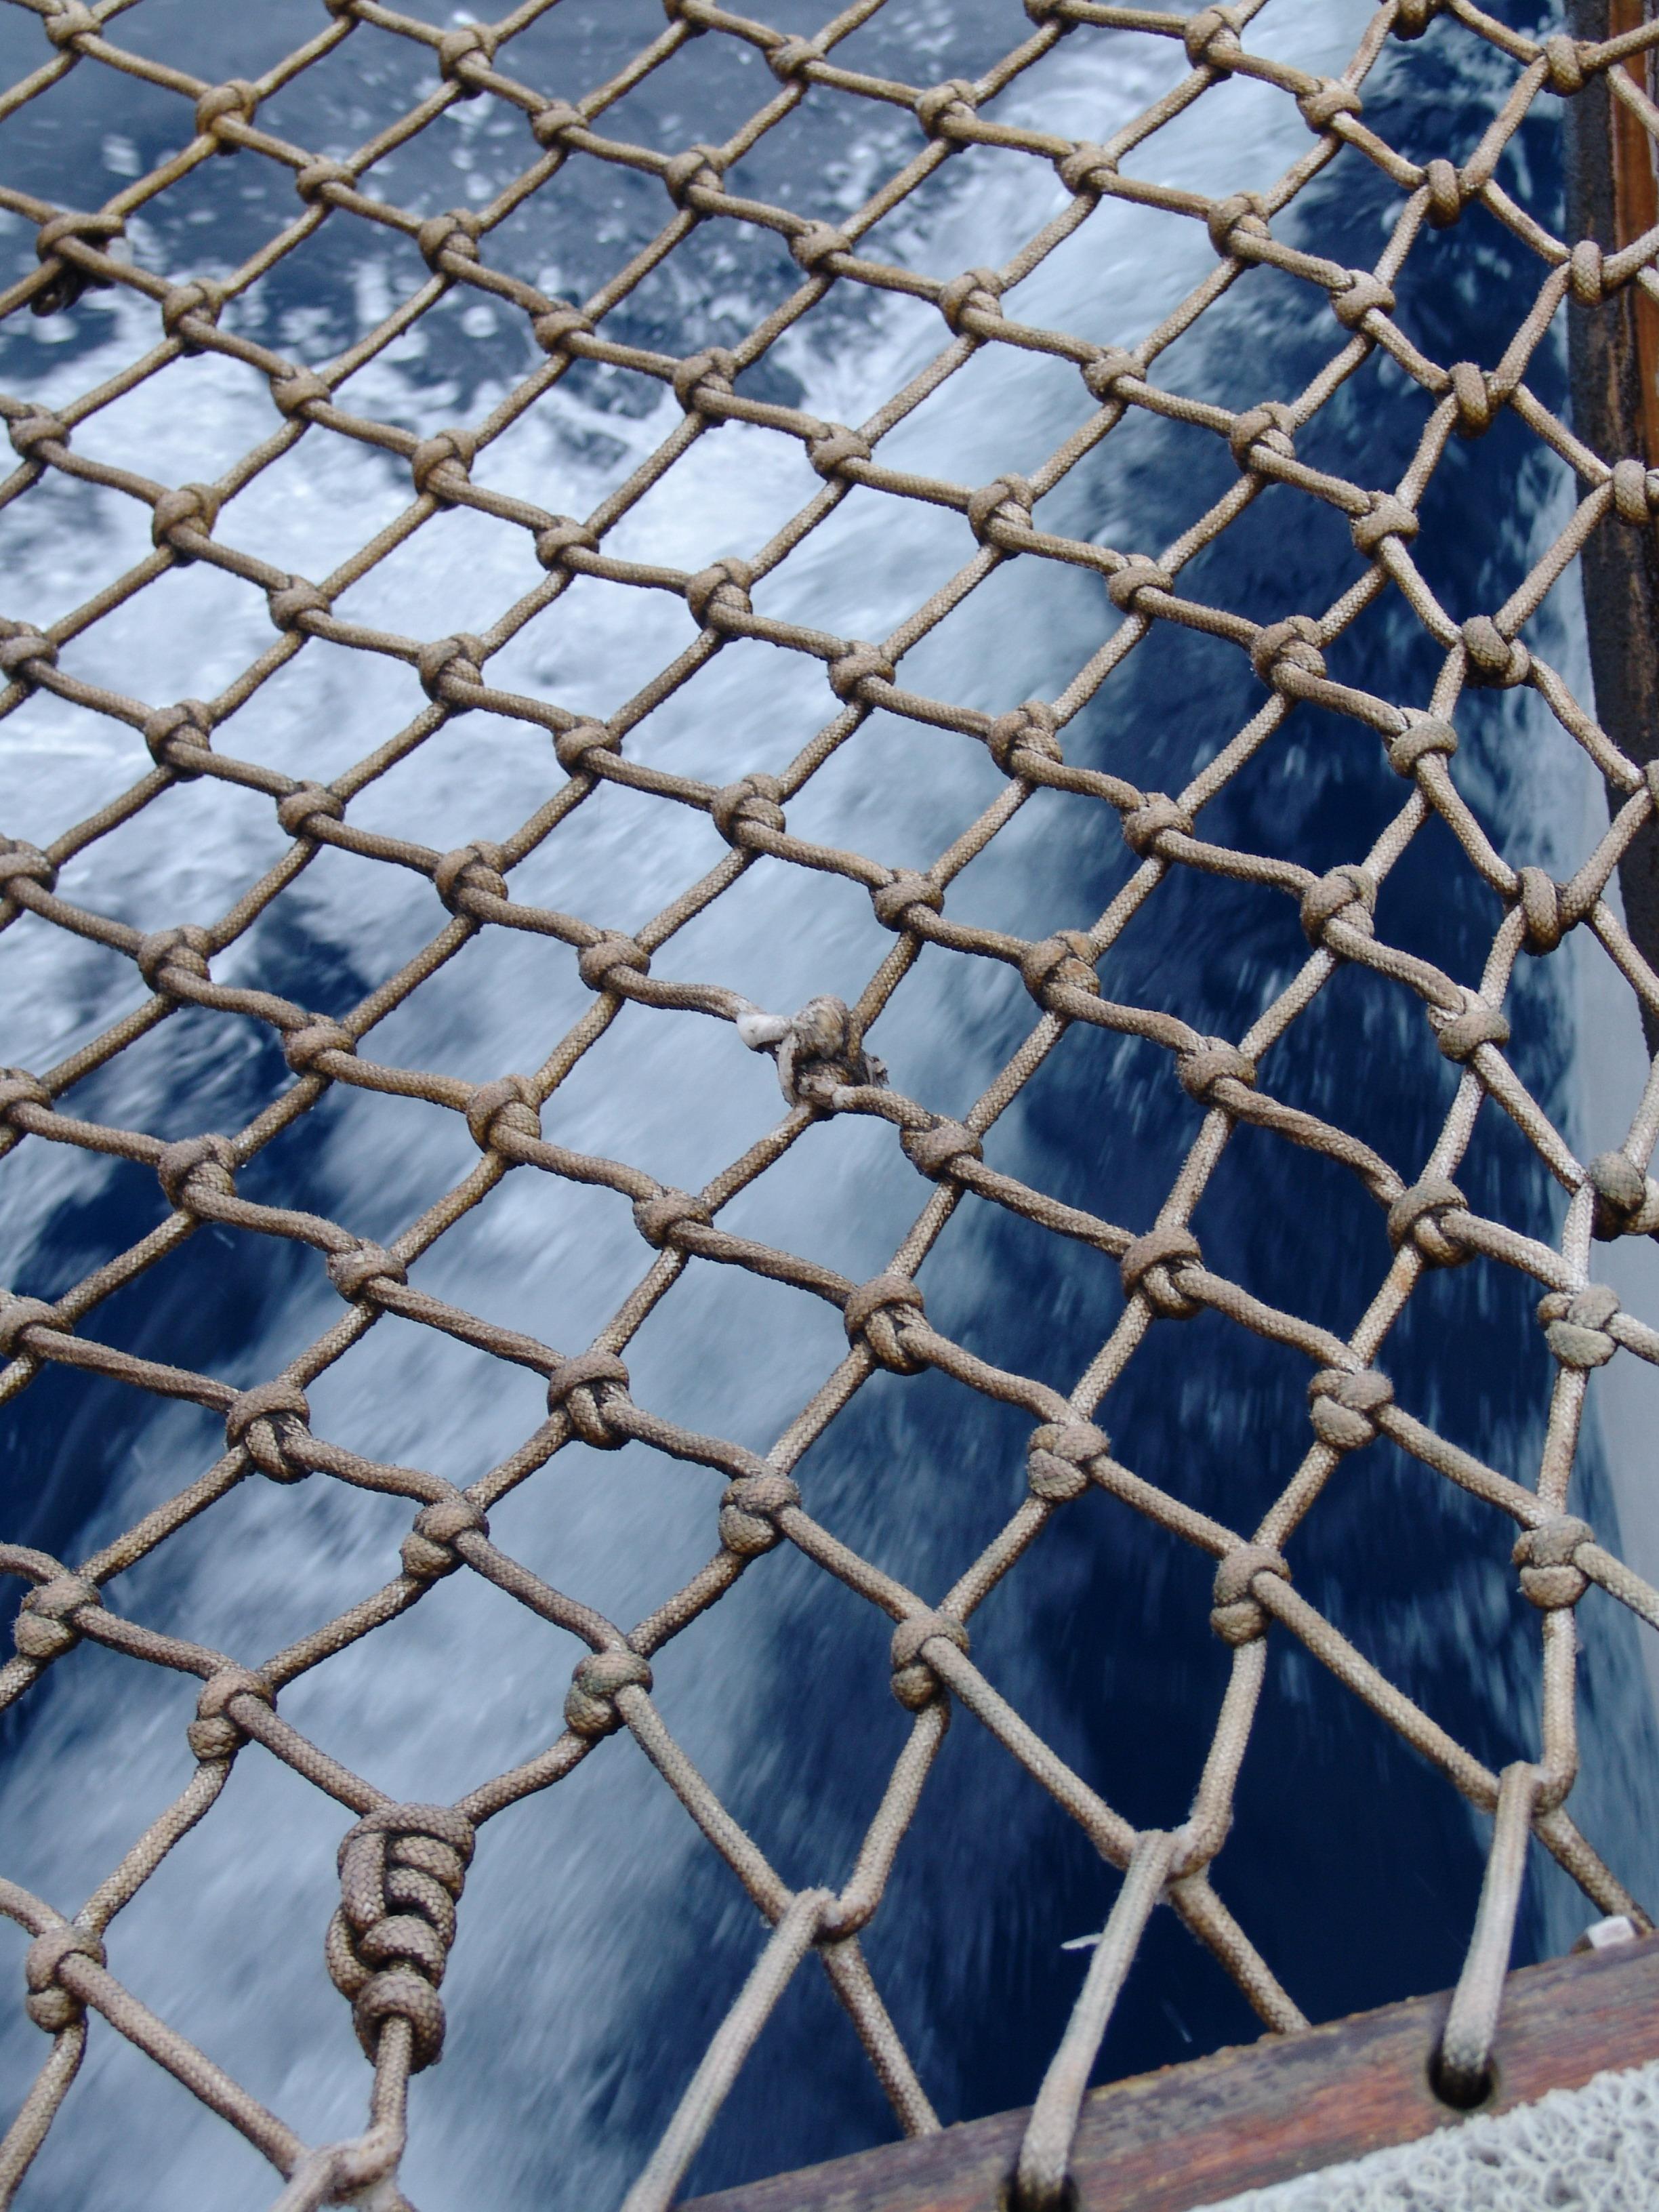 filea boats wake seen through a rope netjpg